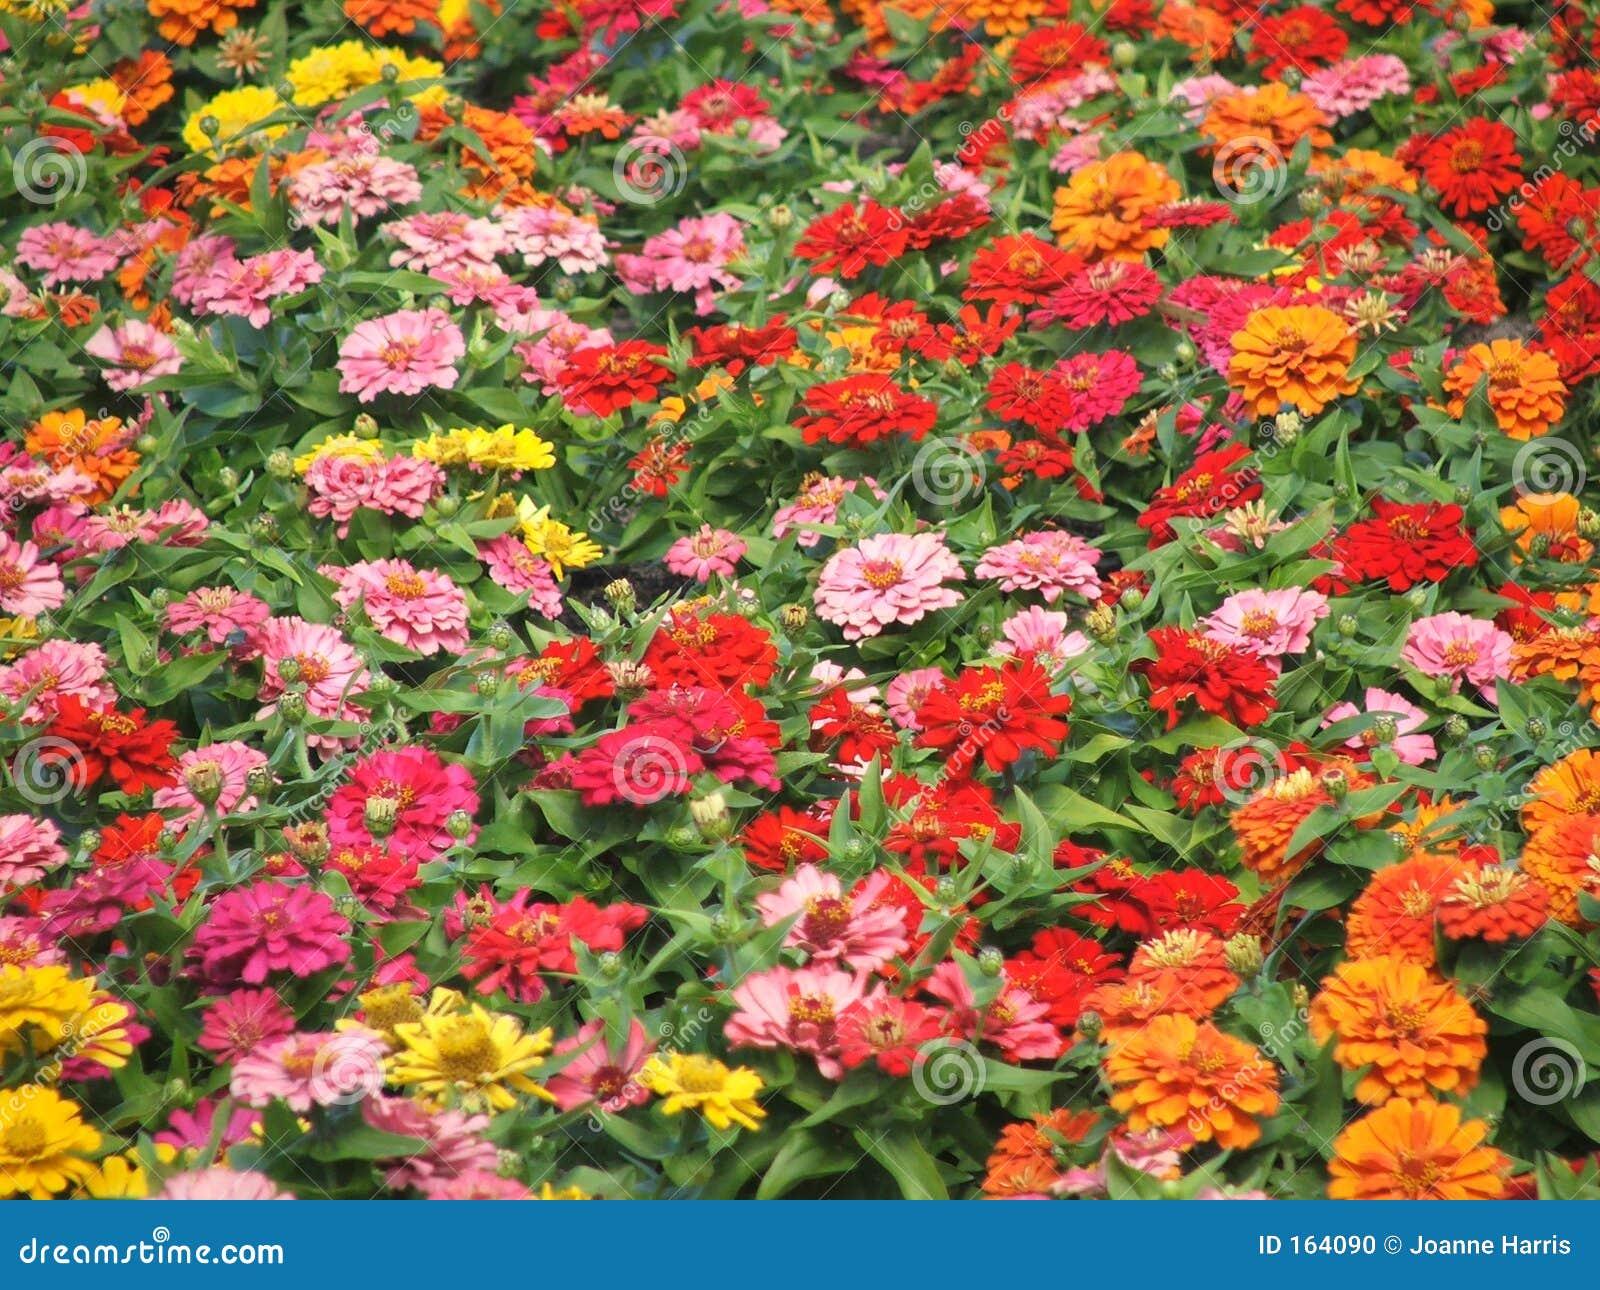 Autumn coloured little flowers